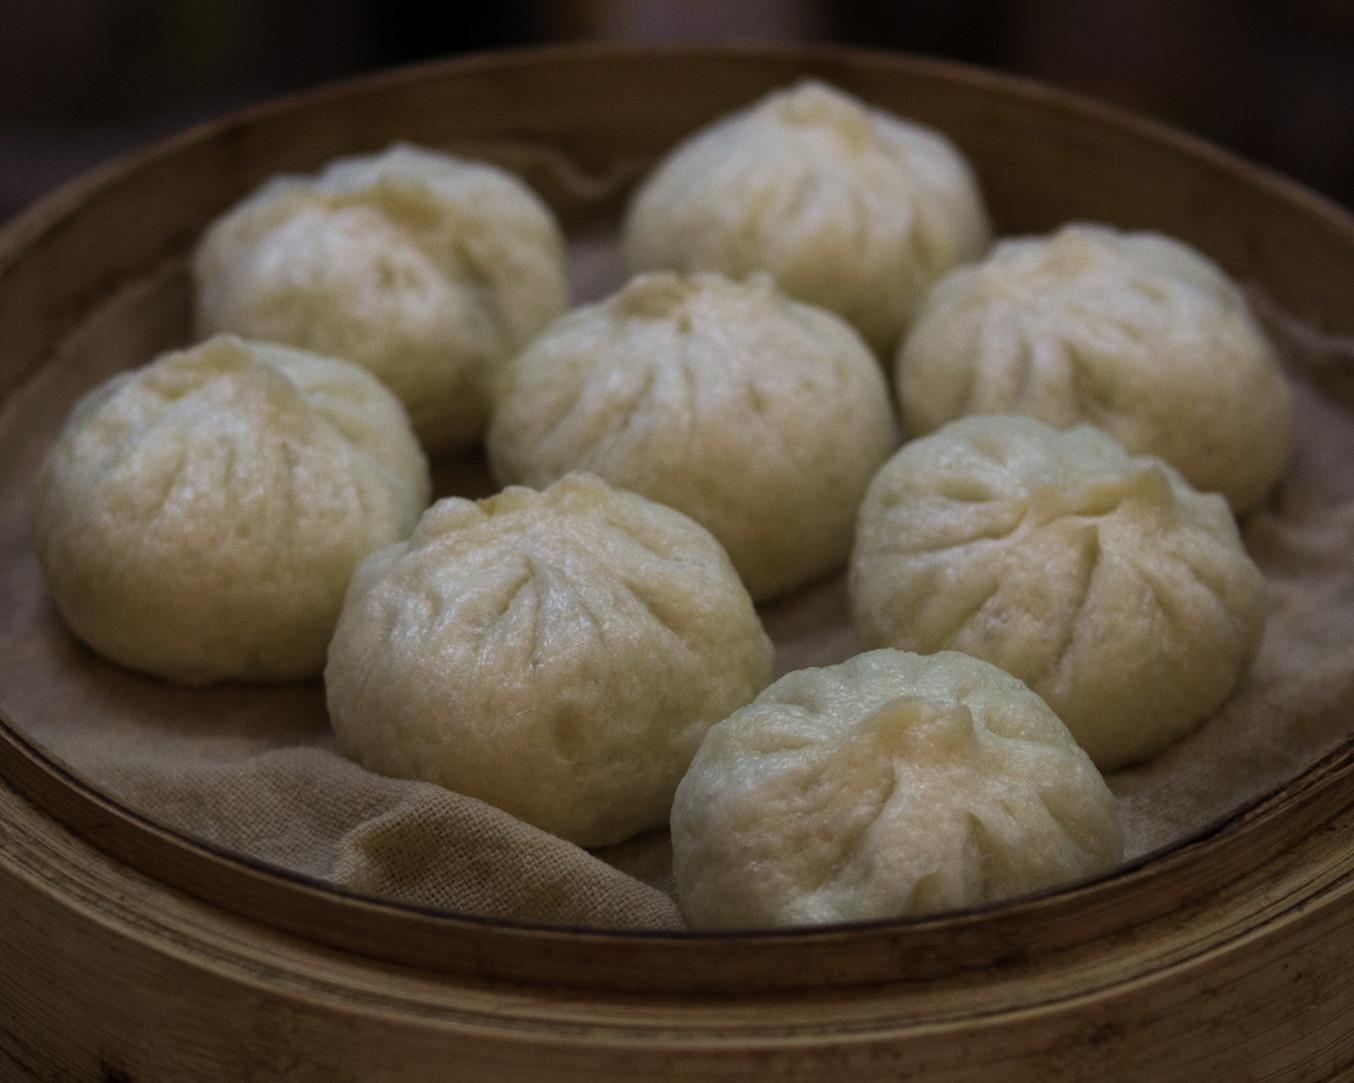 #15_OW_0485_Steamed Dumpling